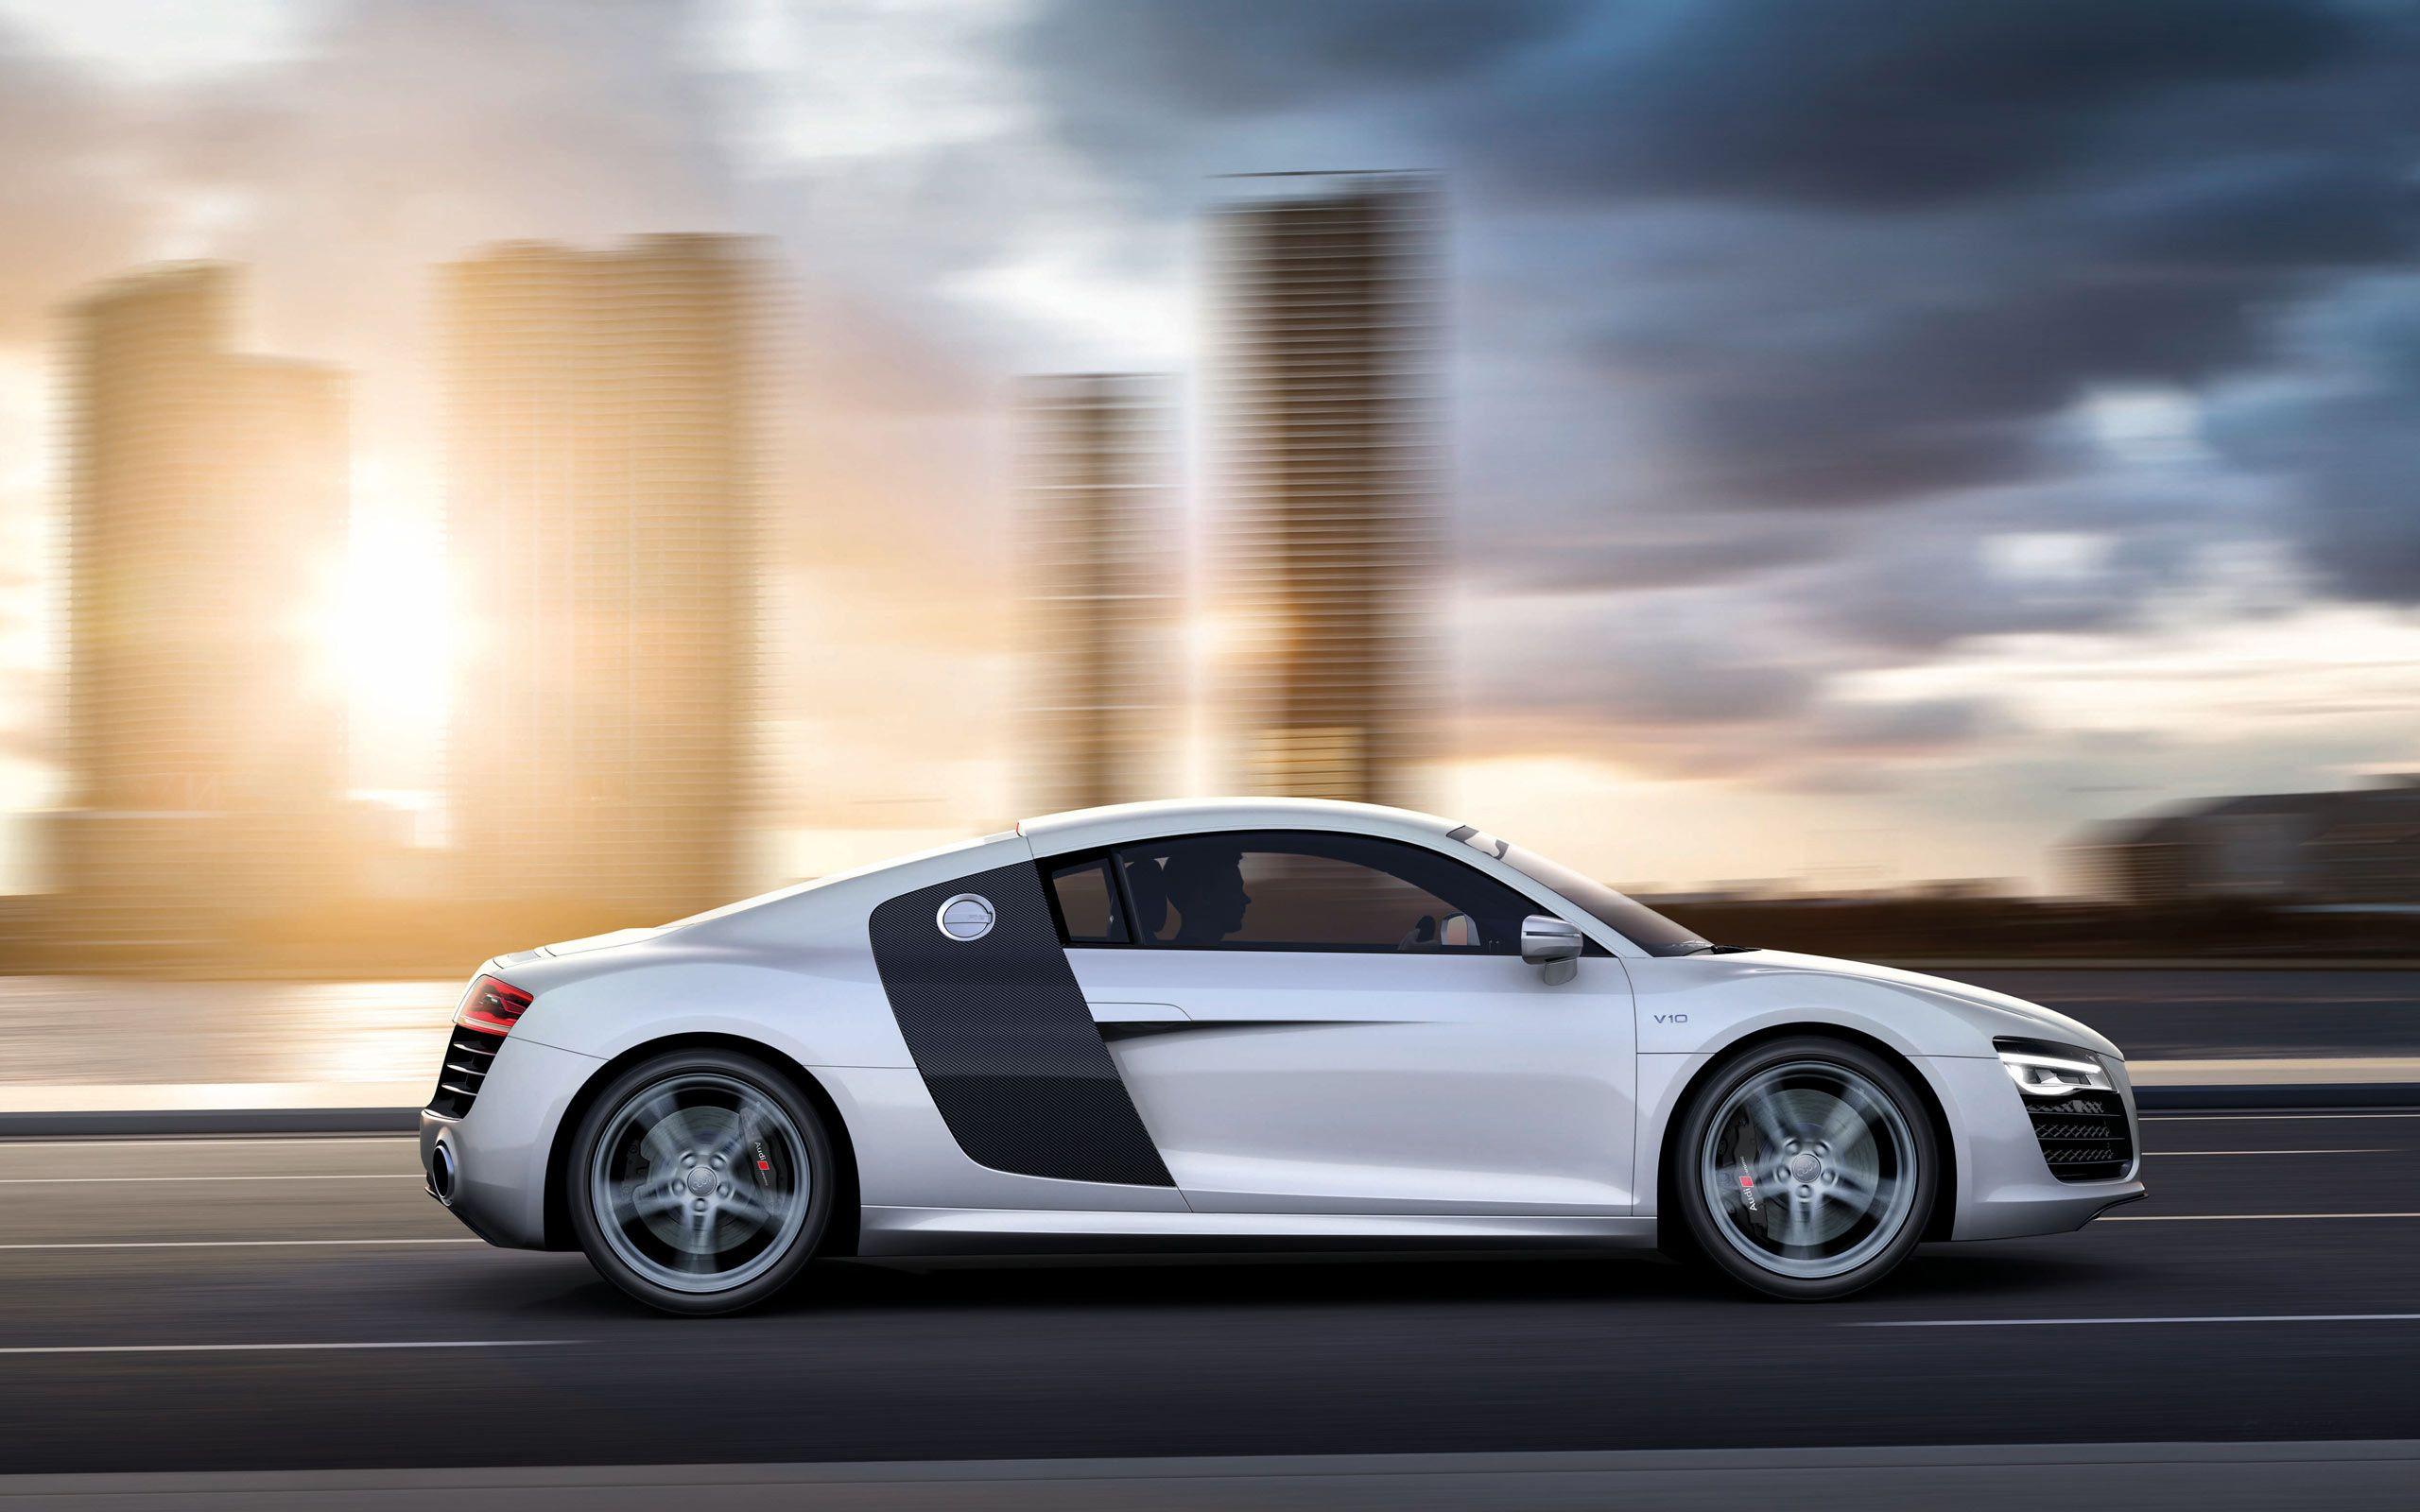 Cool Audi R Animated Wallpaper